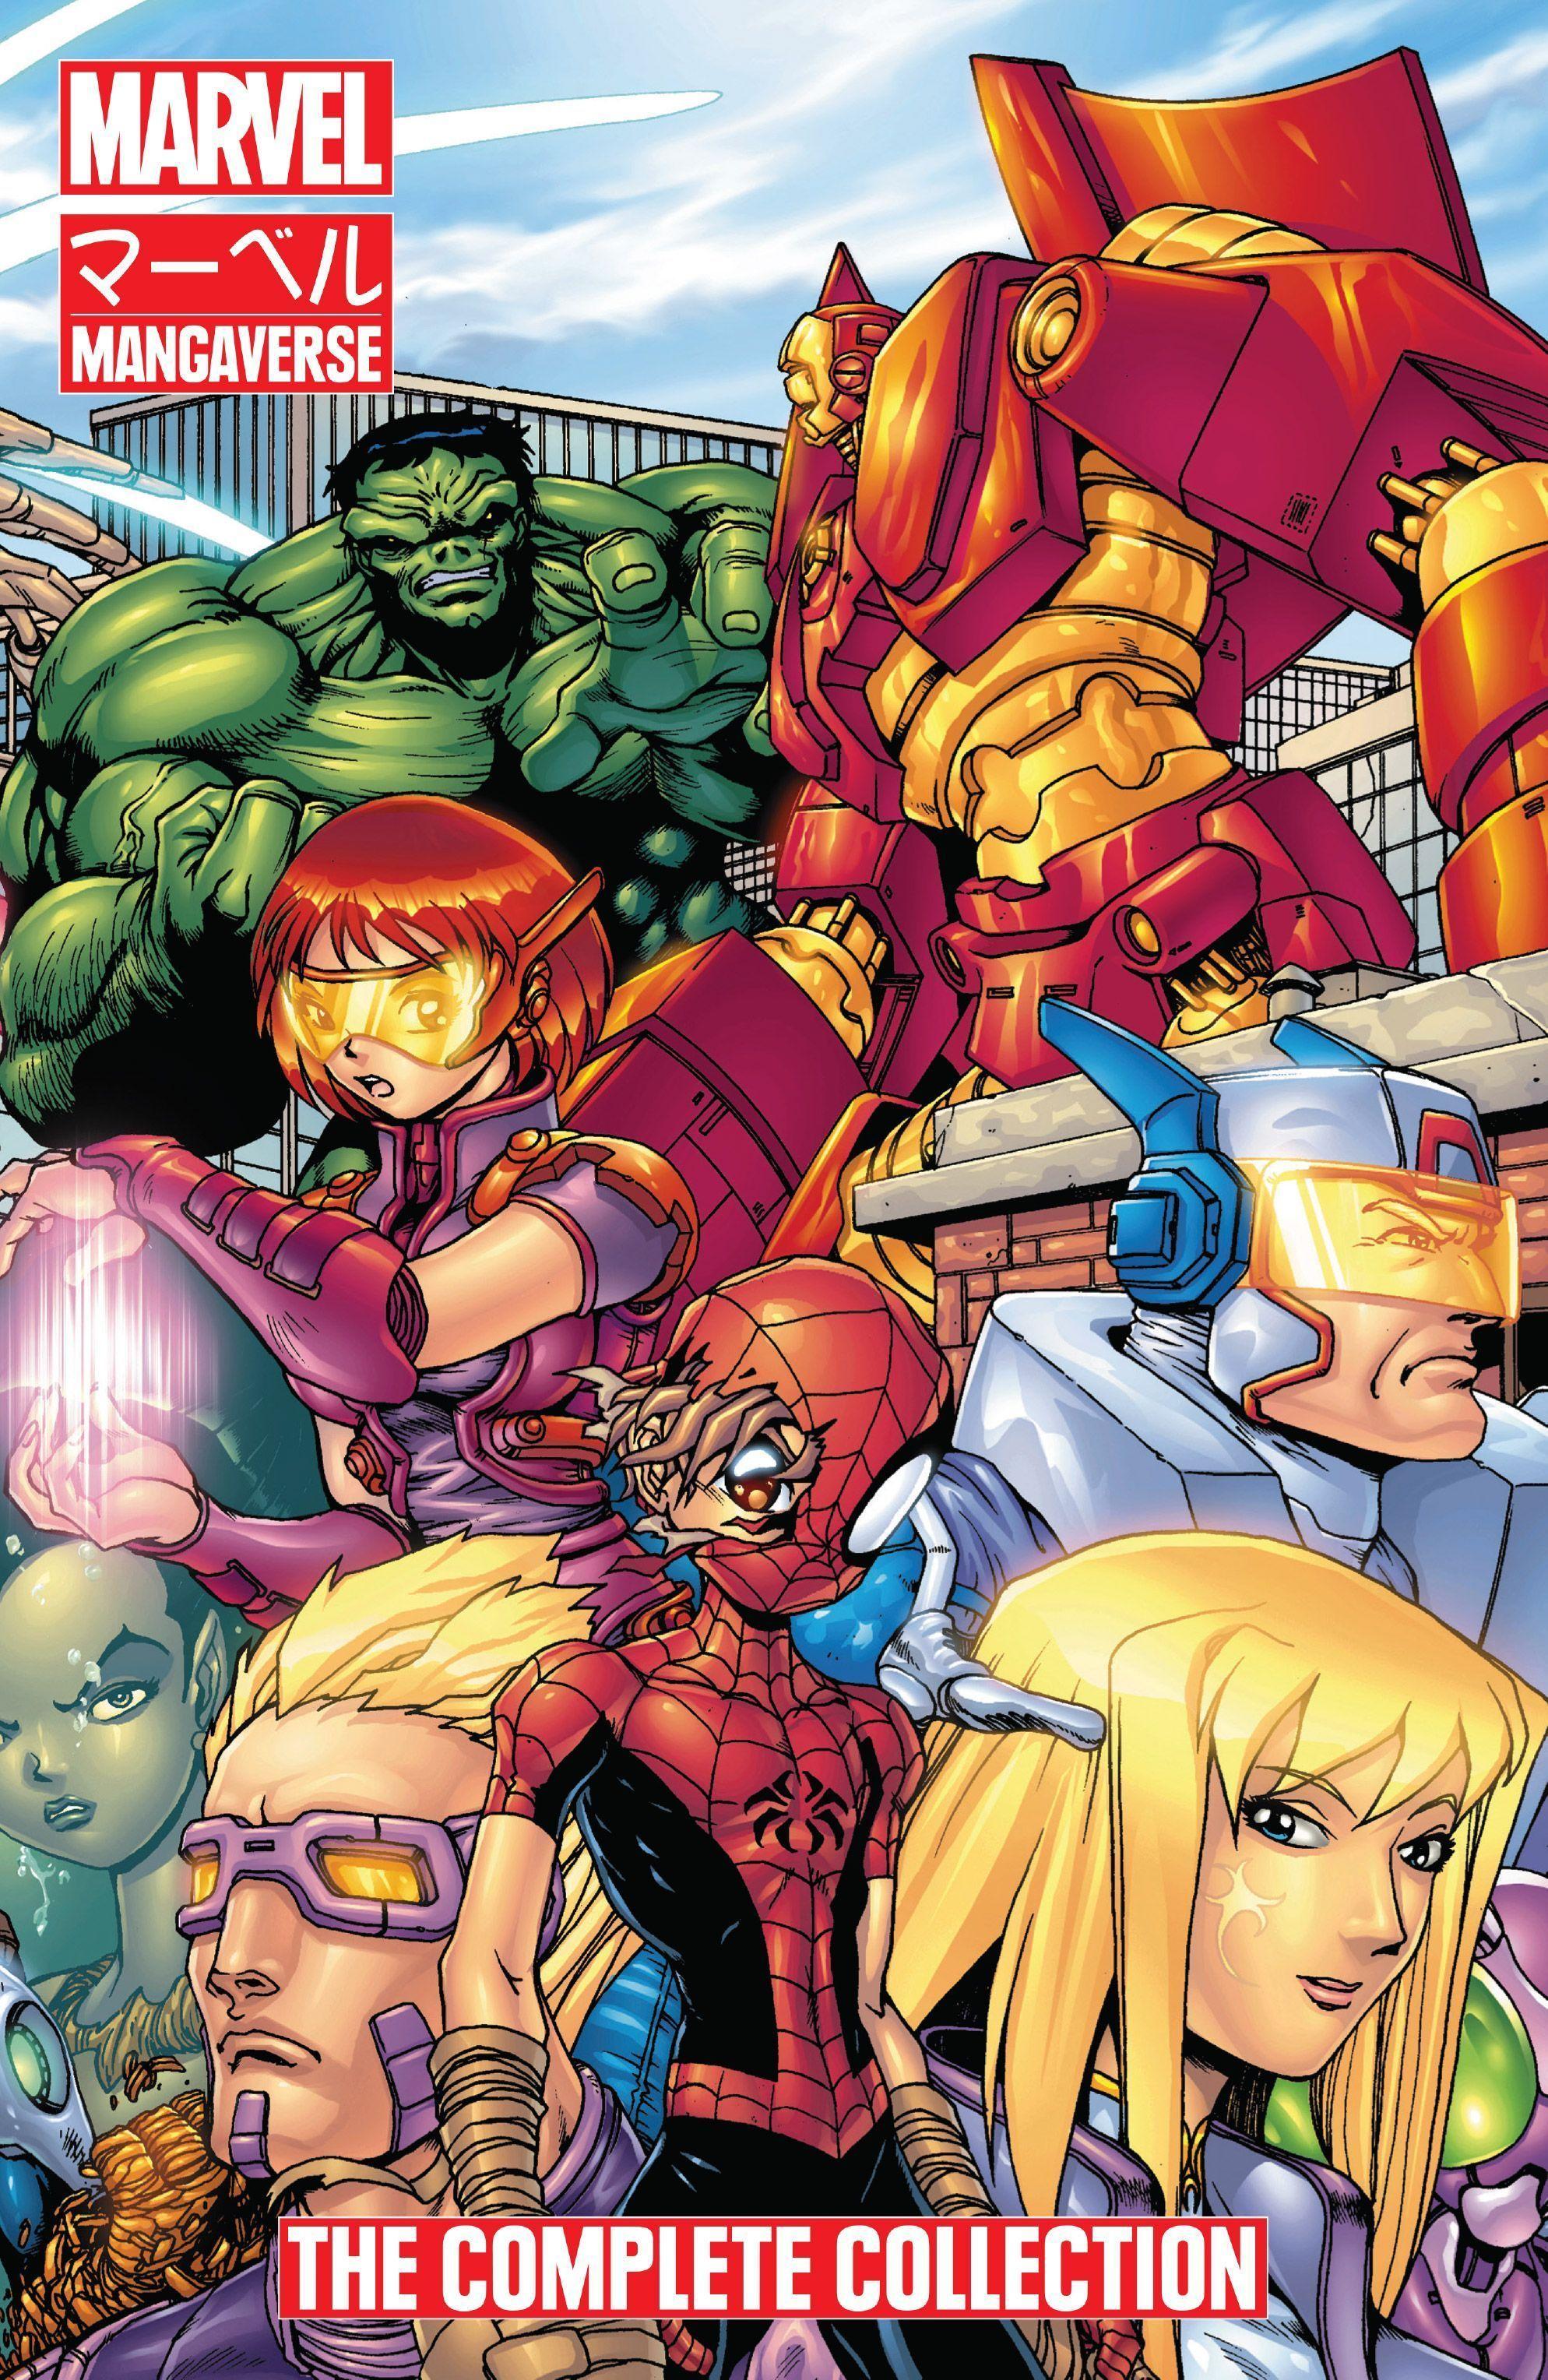 Marvel Manga 1 - Marvel Mangaverse: The Complete Collection